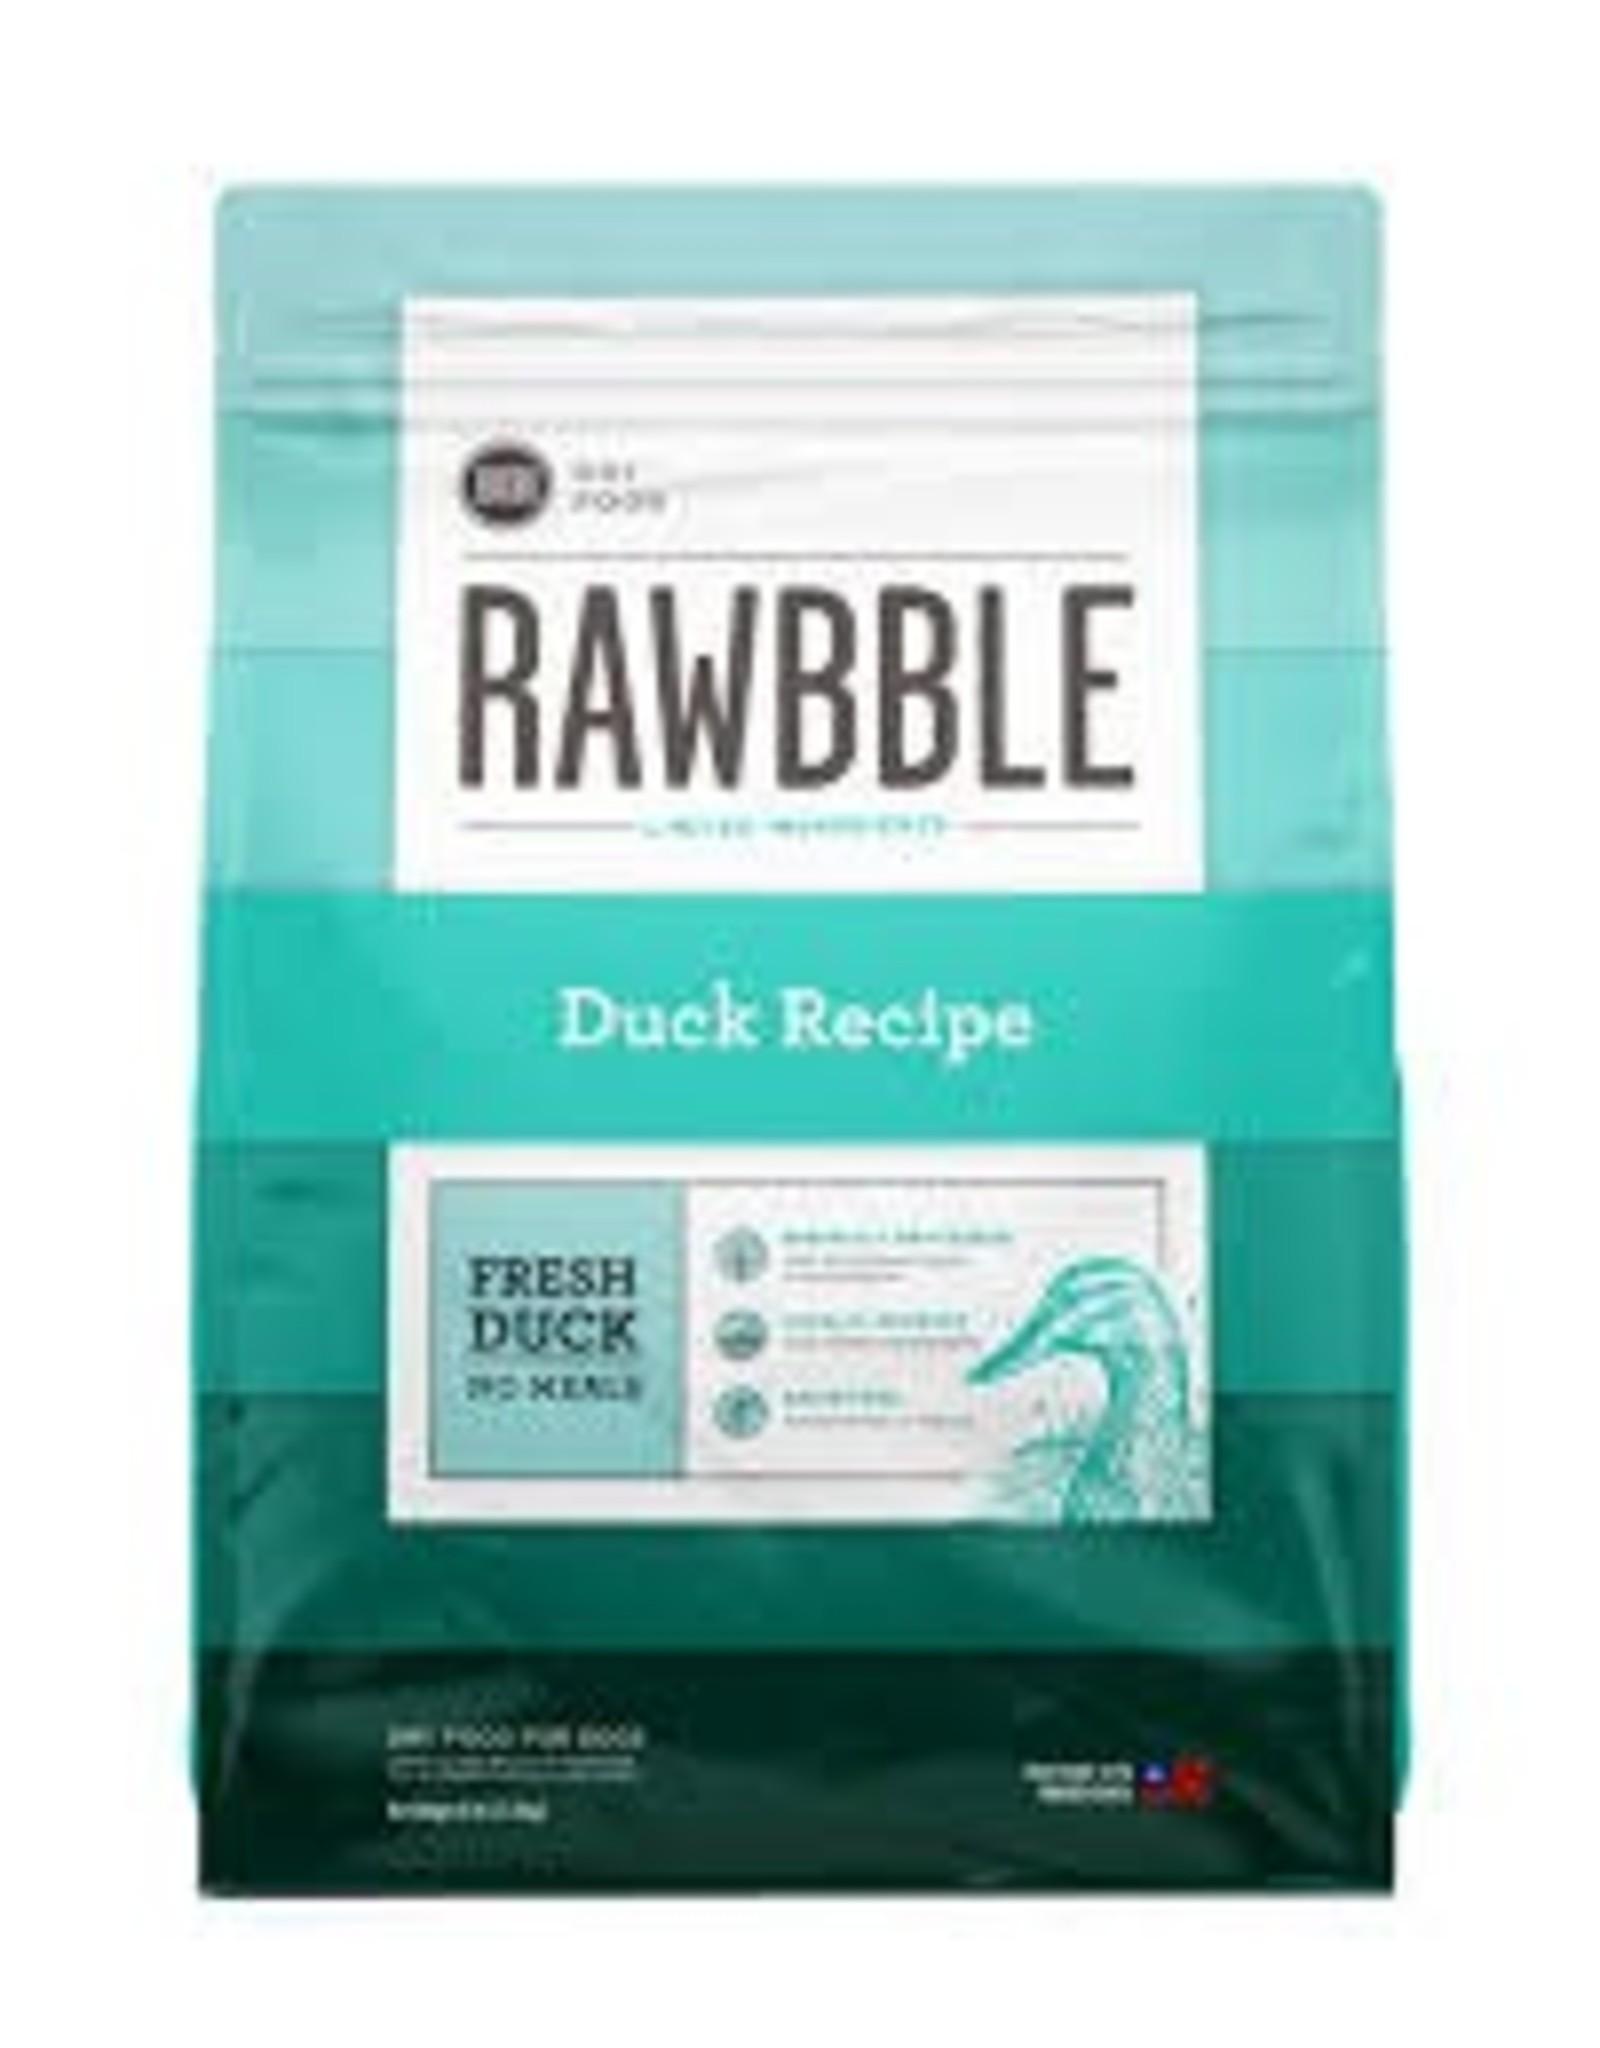 BIXBI & RAWBBLE RAWBBLE DUCK RECIPE 4#